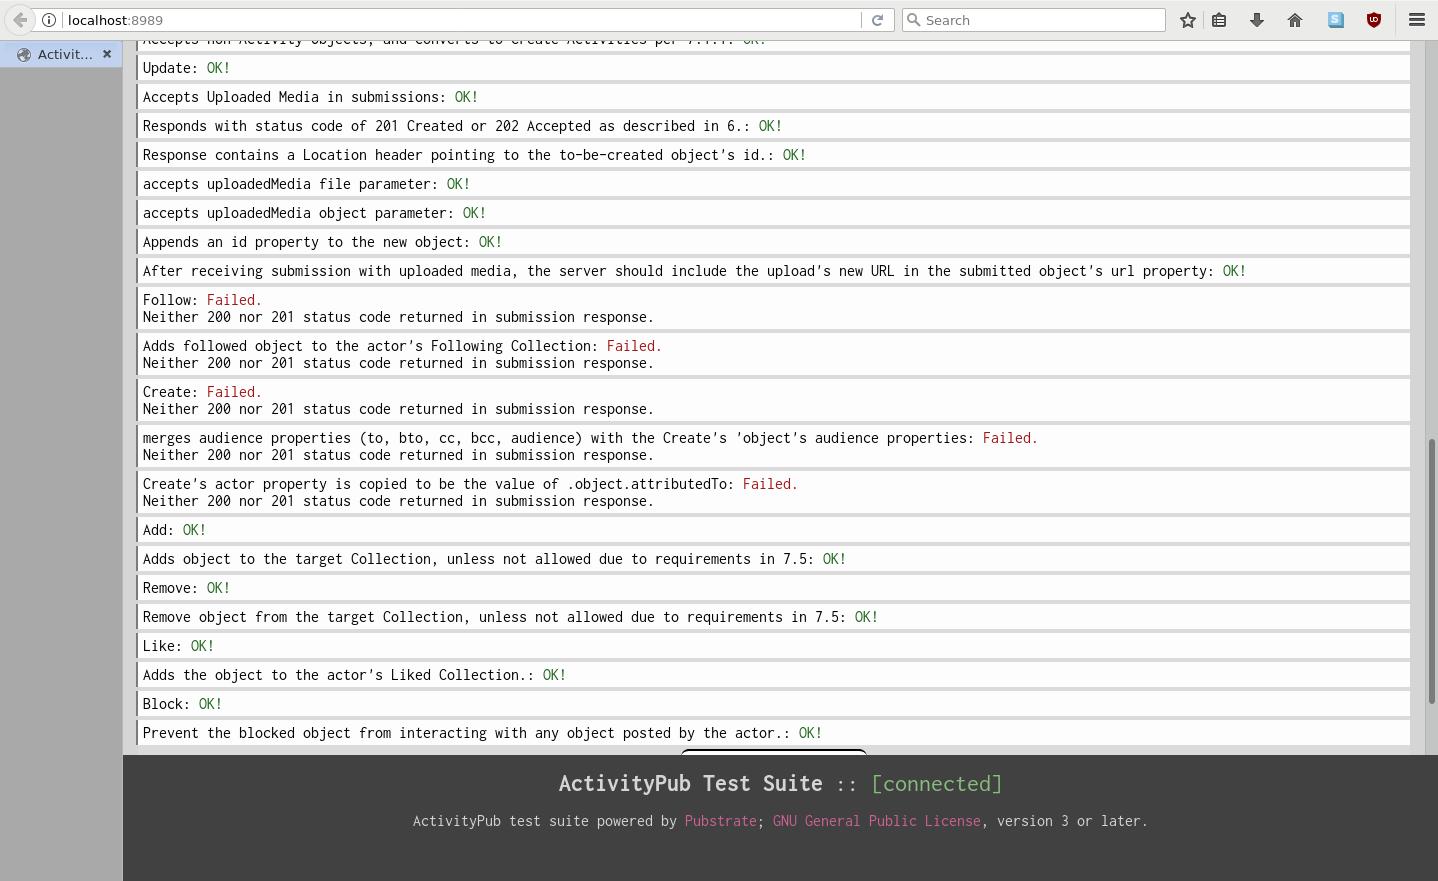 activitypub-test-suite-wip1.png